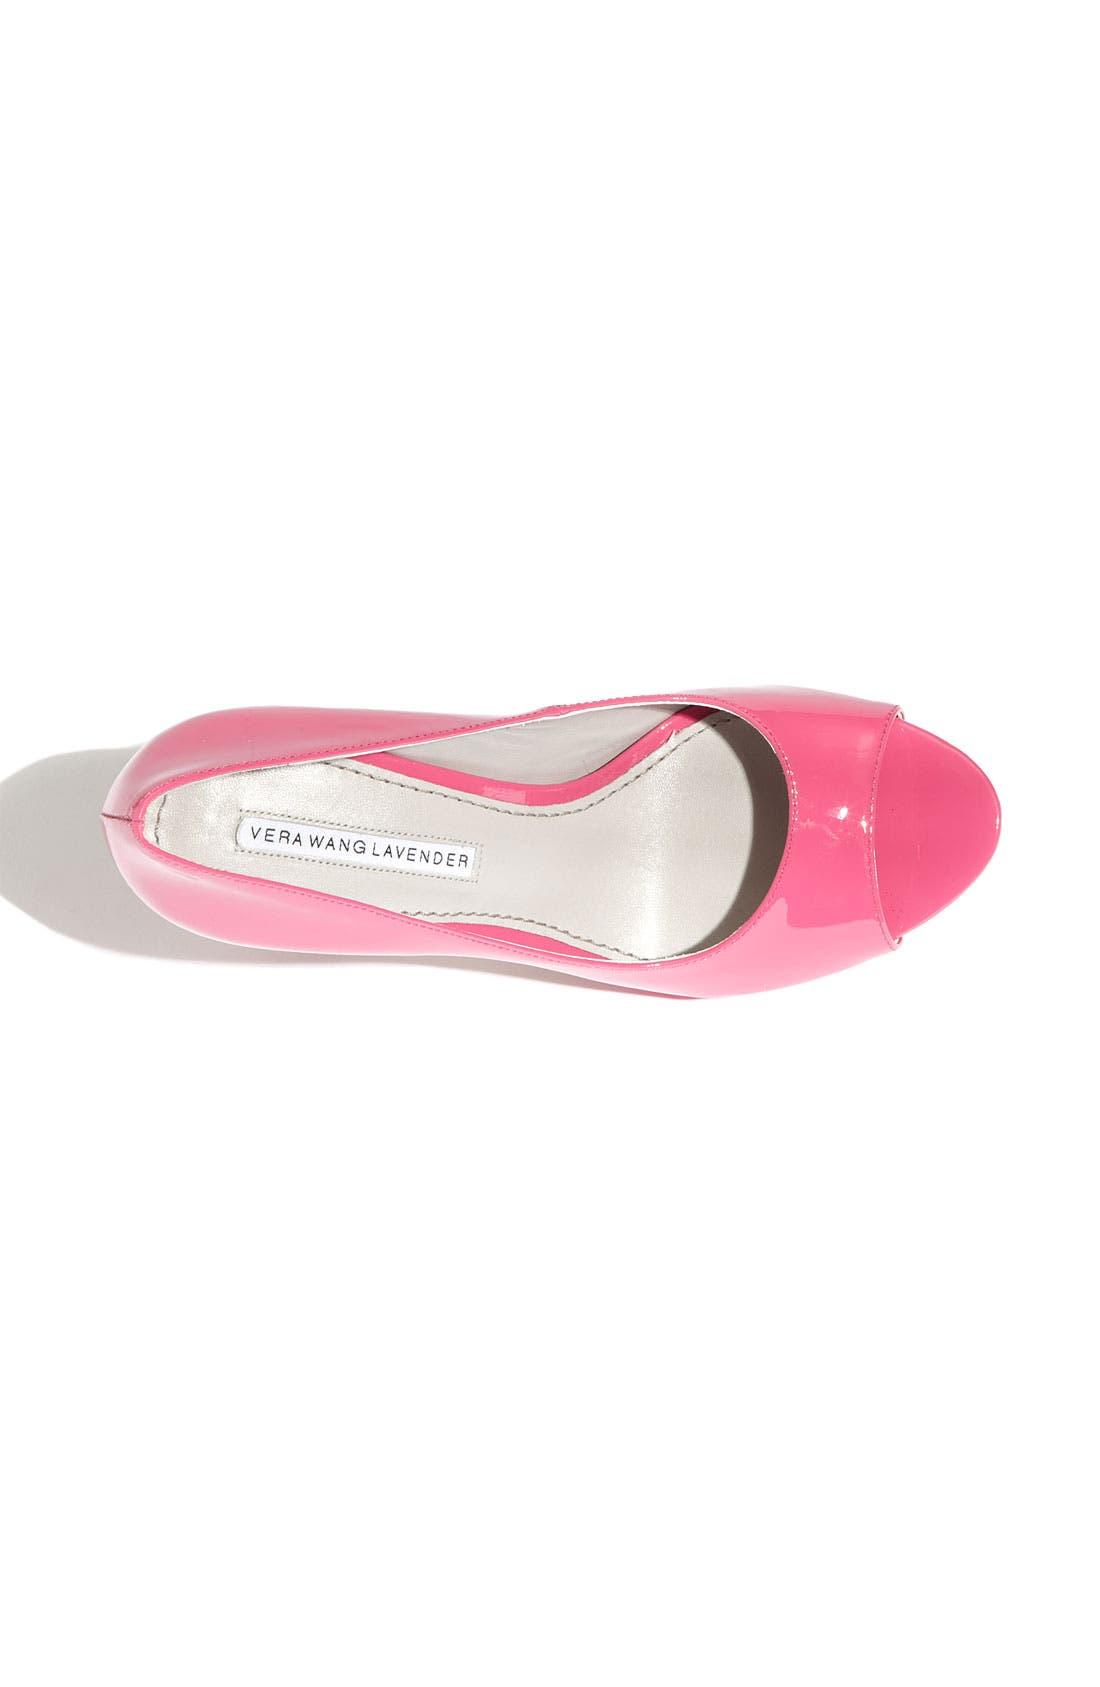 Alternate Image 3  - Vera Wang Footwear 'Selima' Pump